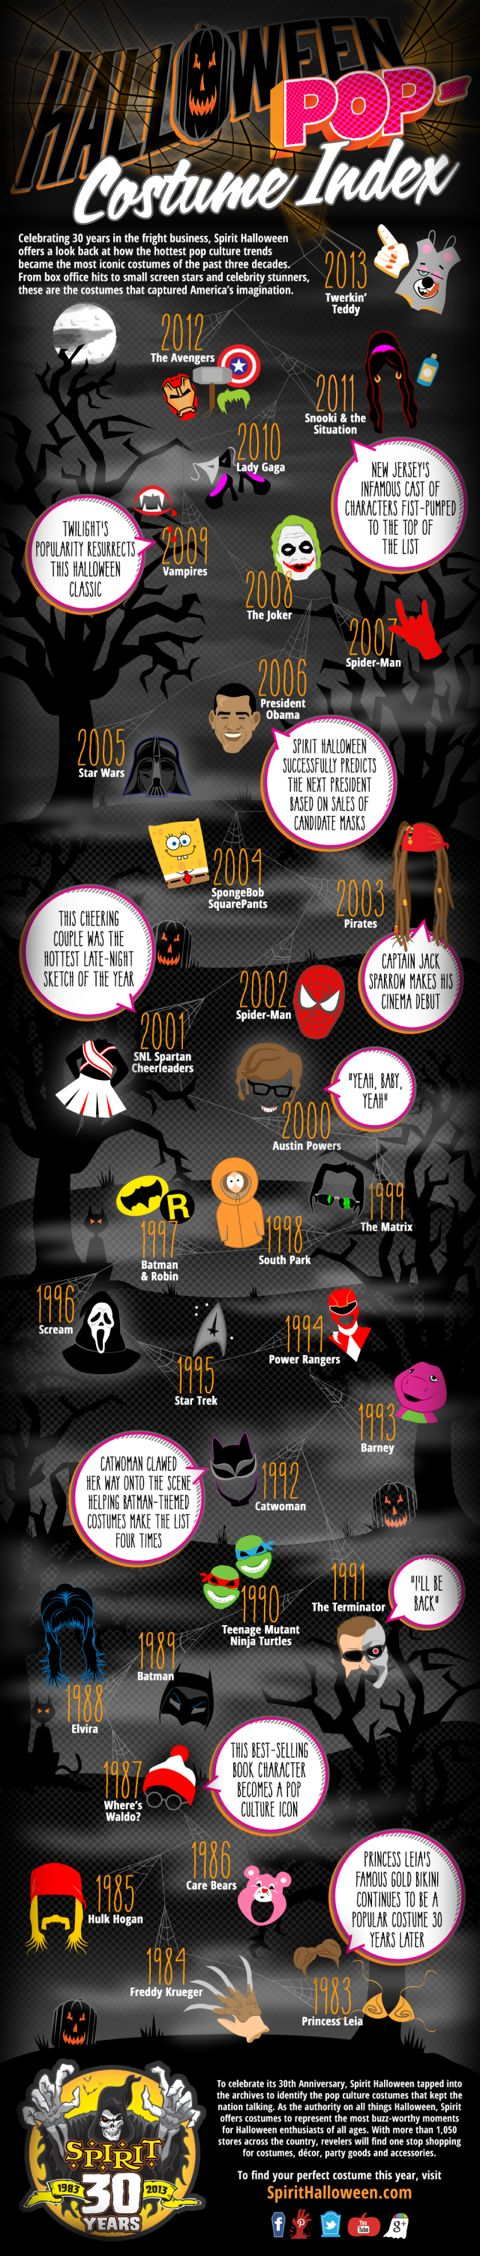 ideas para disfraces de #halloween #custom #ideas #infography